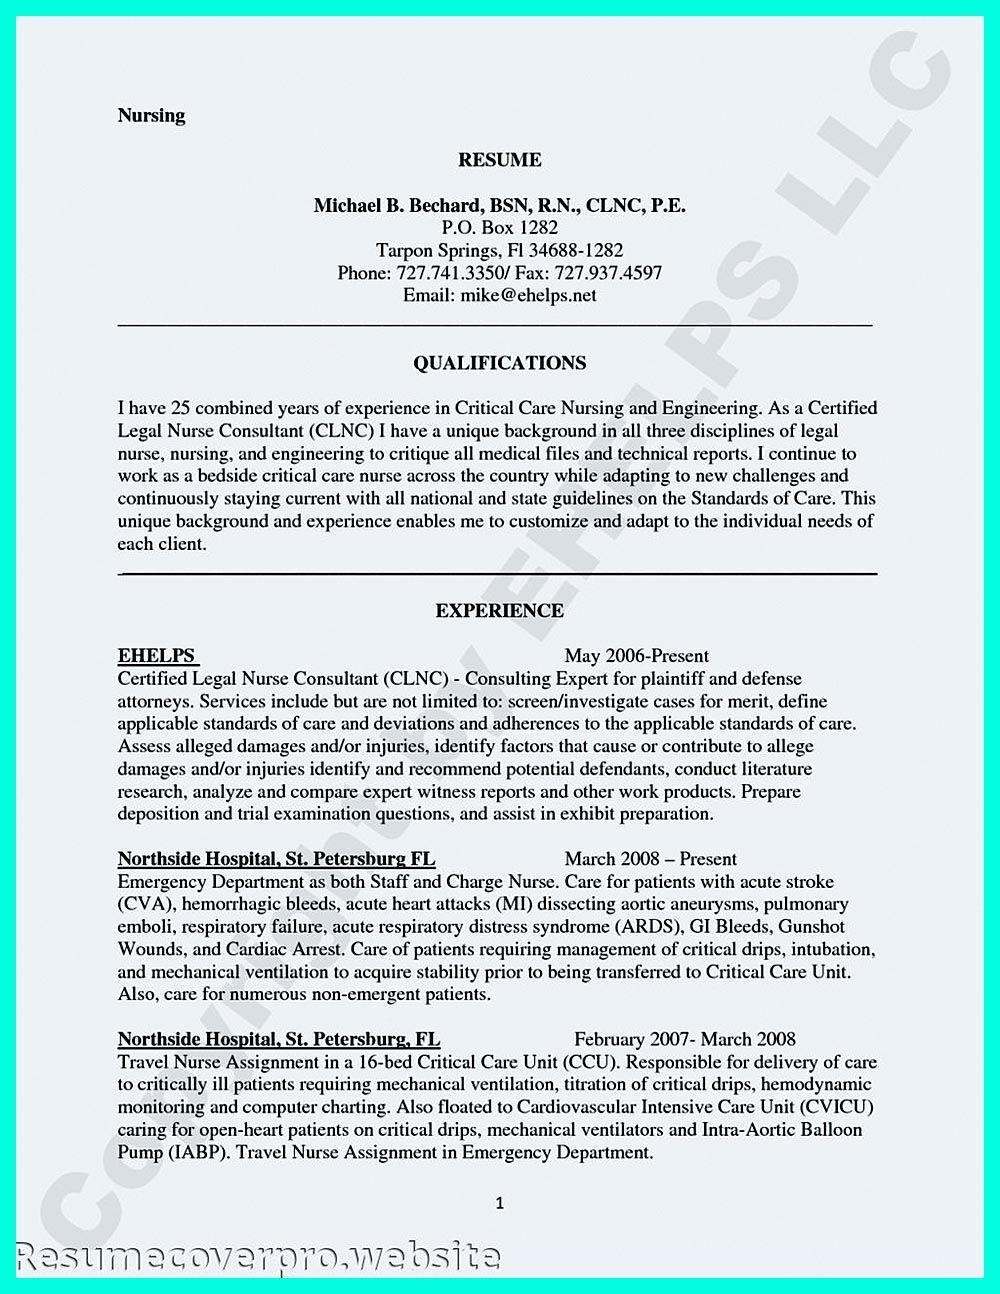 Job Descriptions for an Icu Nurse Resume Nursing resume